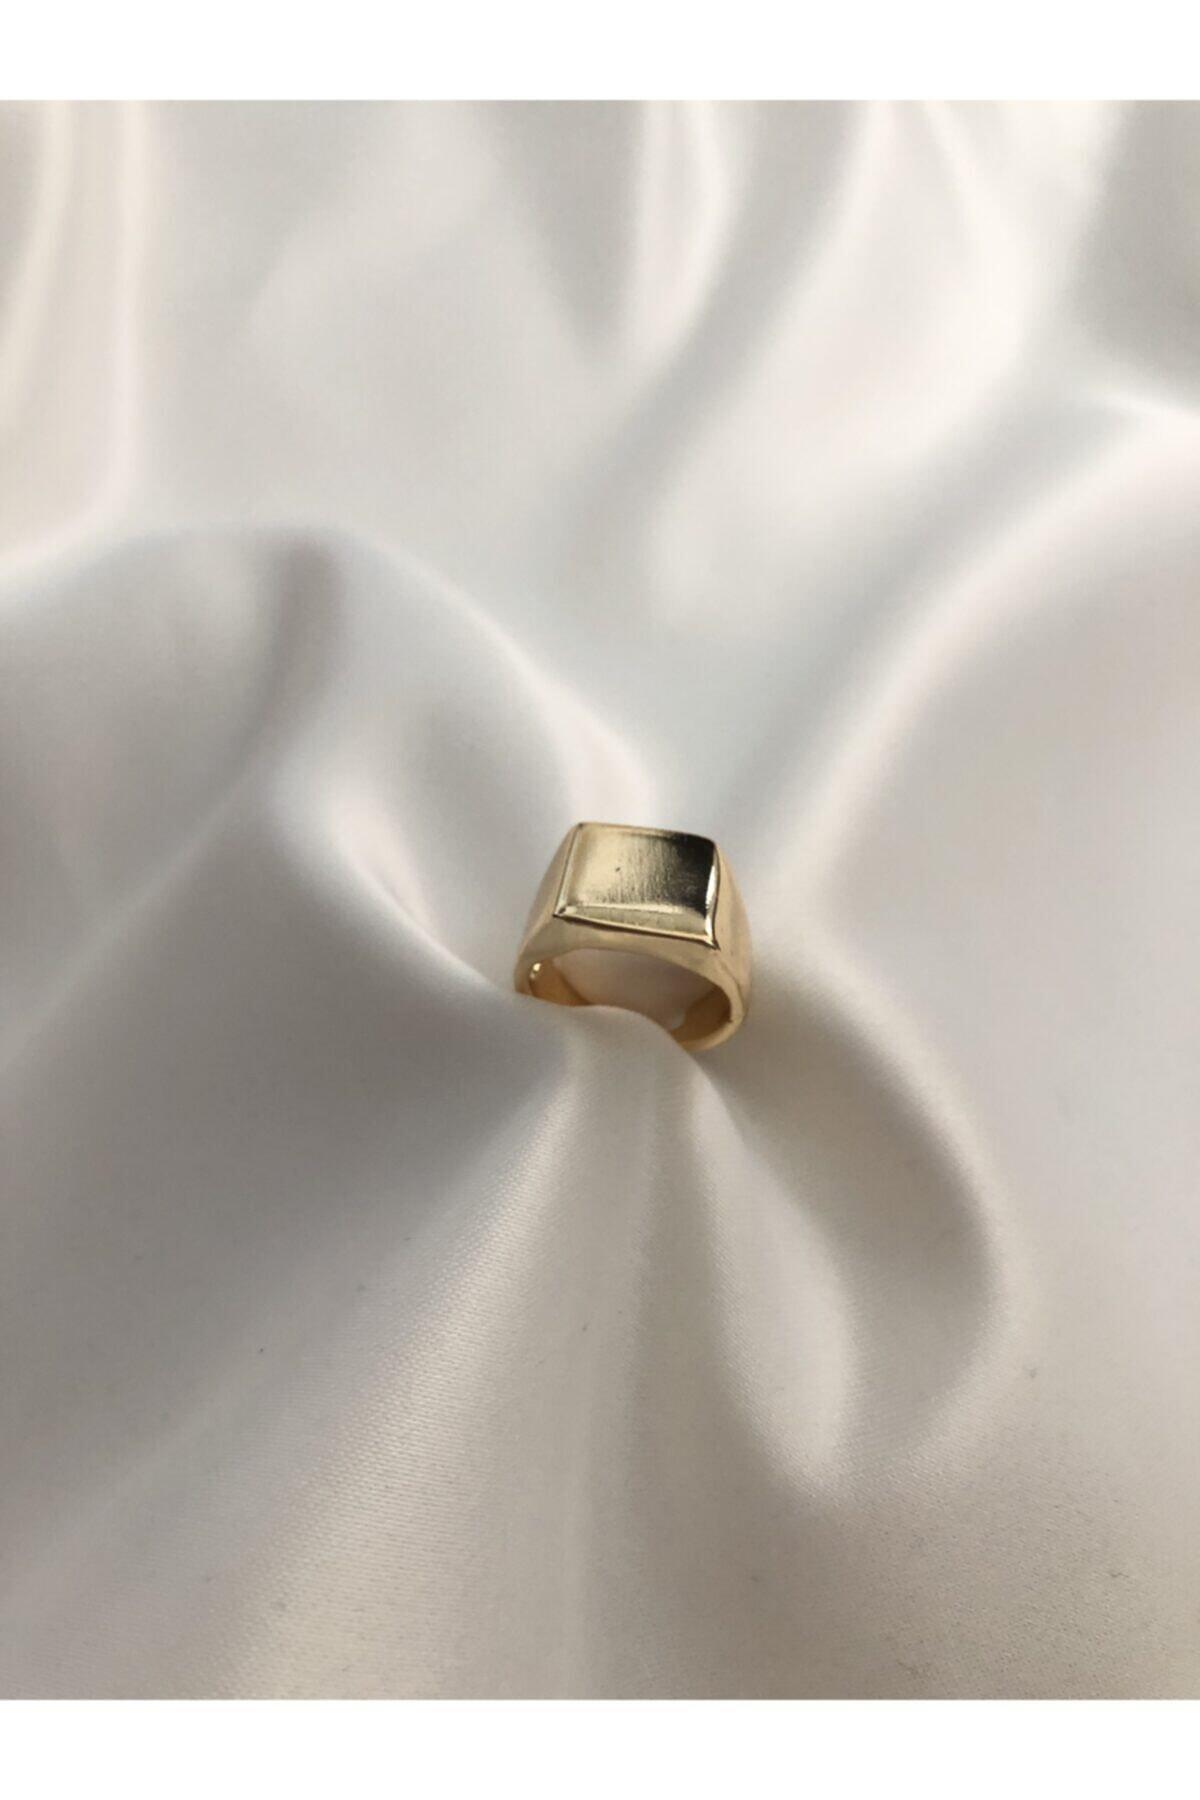 The Y Jewelry Gold Kare Şövalye Yüzük-ayarlanabilir 2